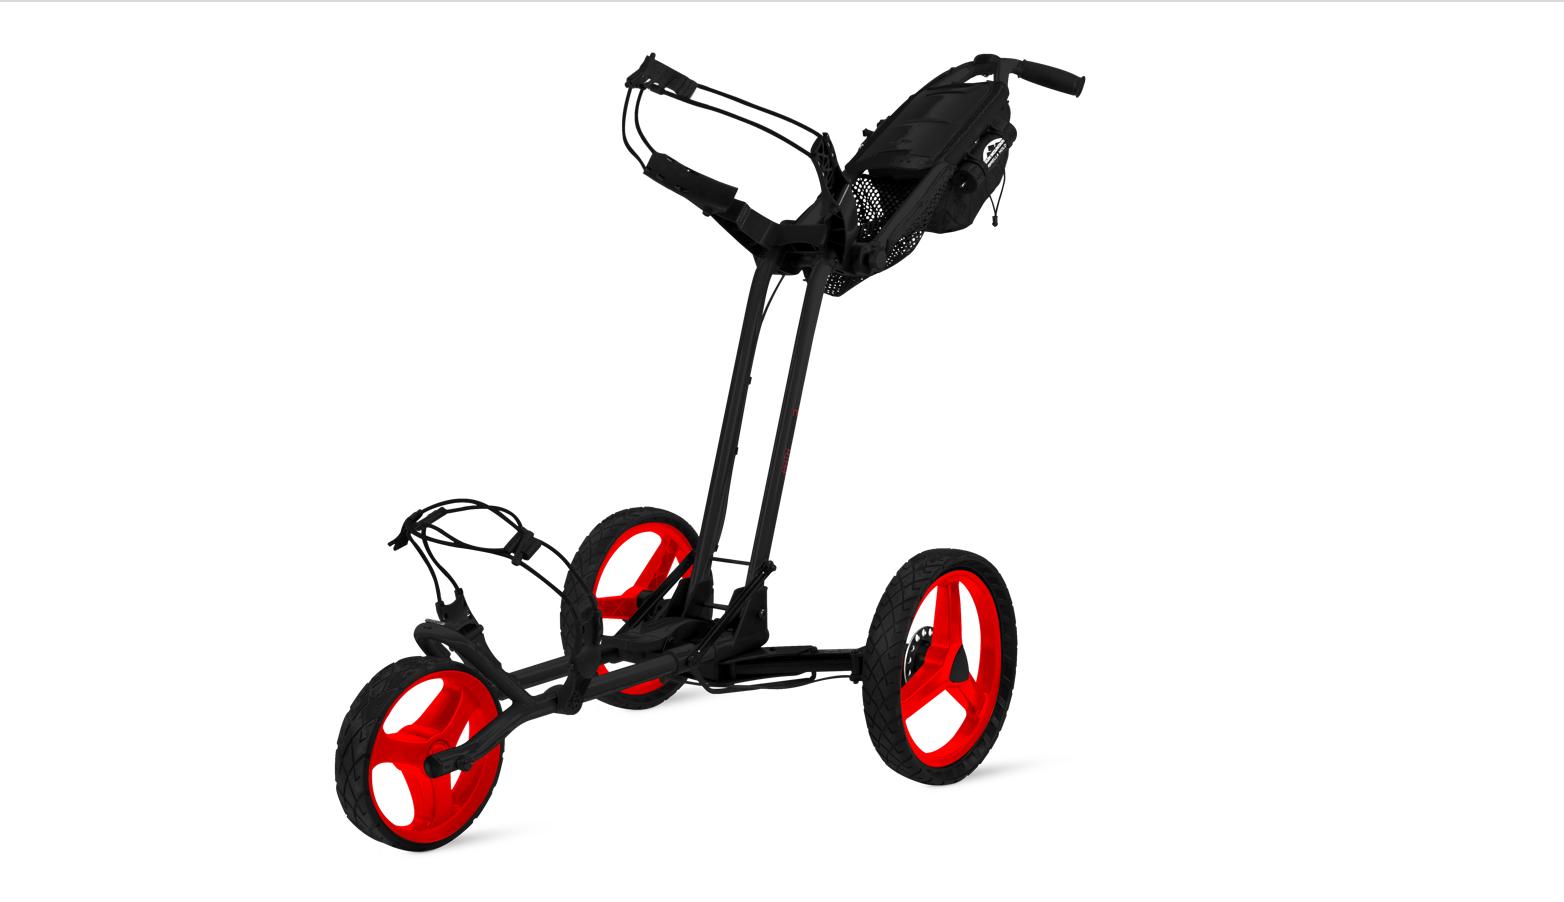 Win a Sun Mountain Pathfinder 3 push trolley sweepstakes